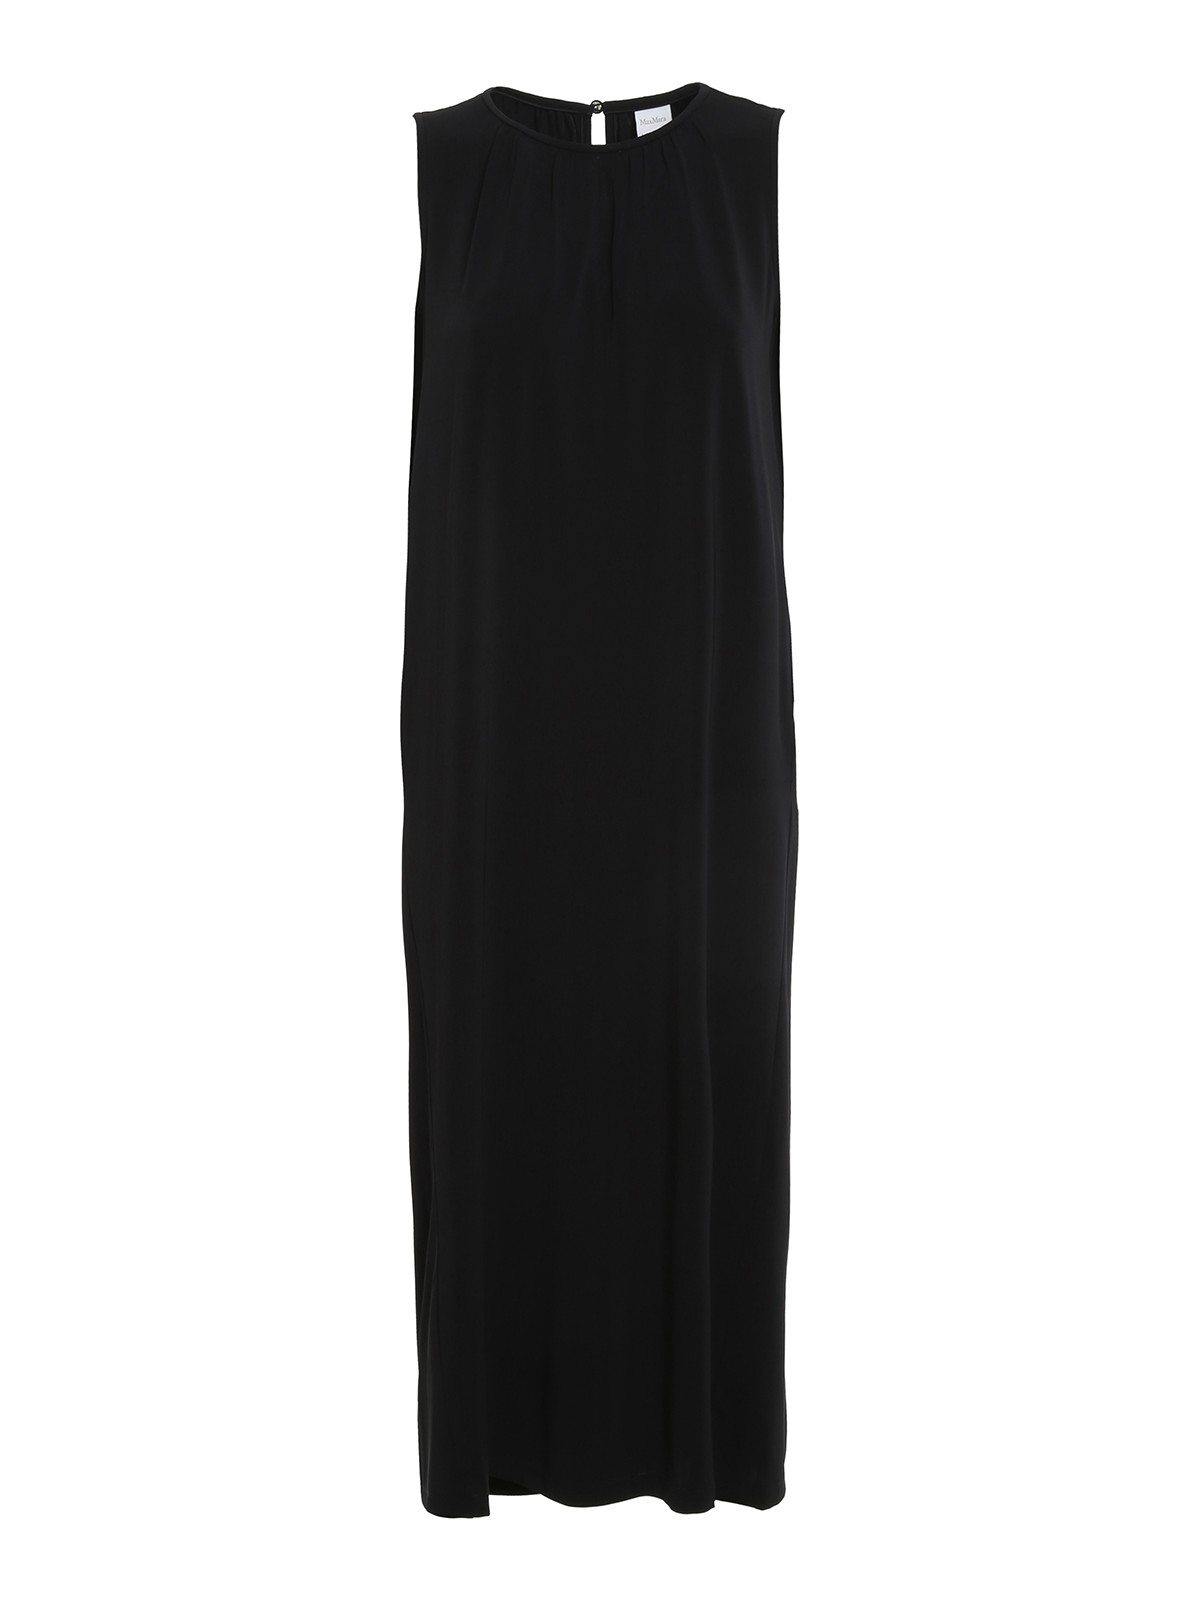 Max Mara Dresses EPOPEA JERSEY DRESS